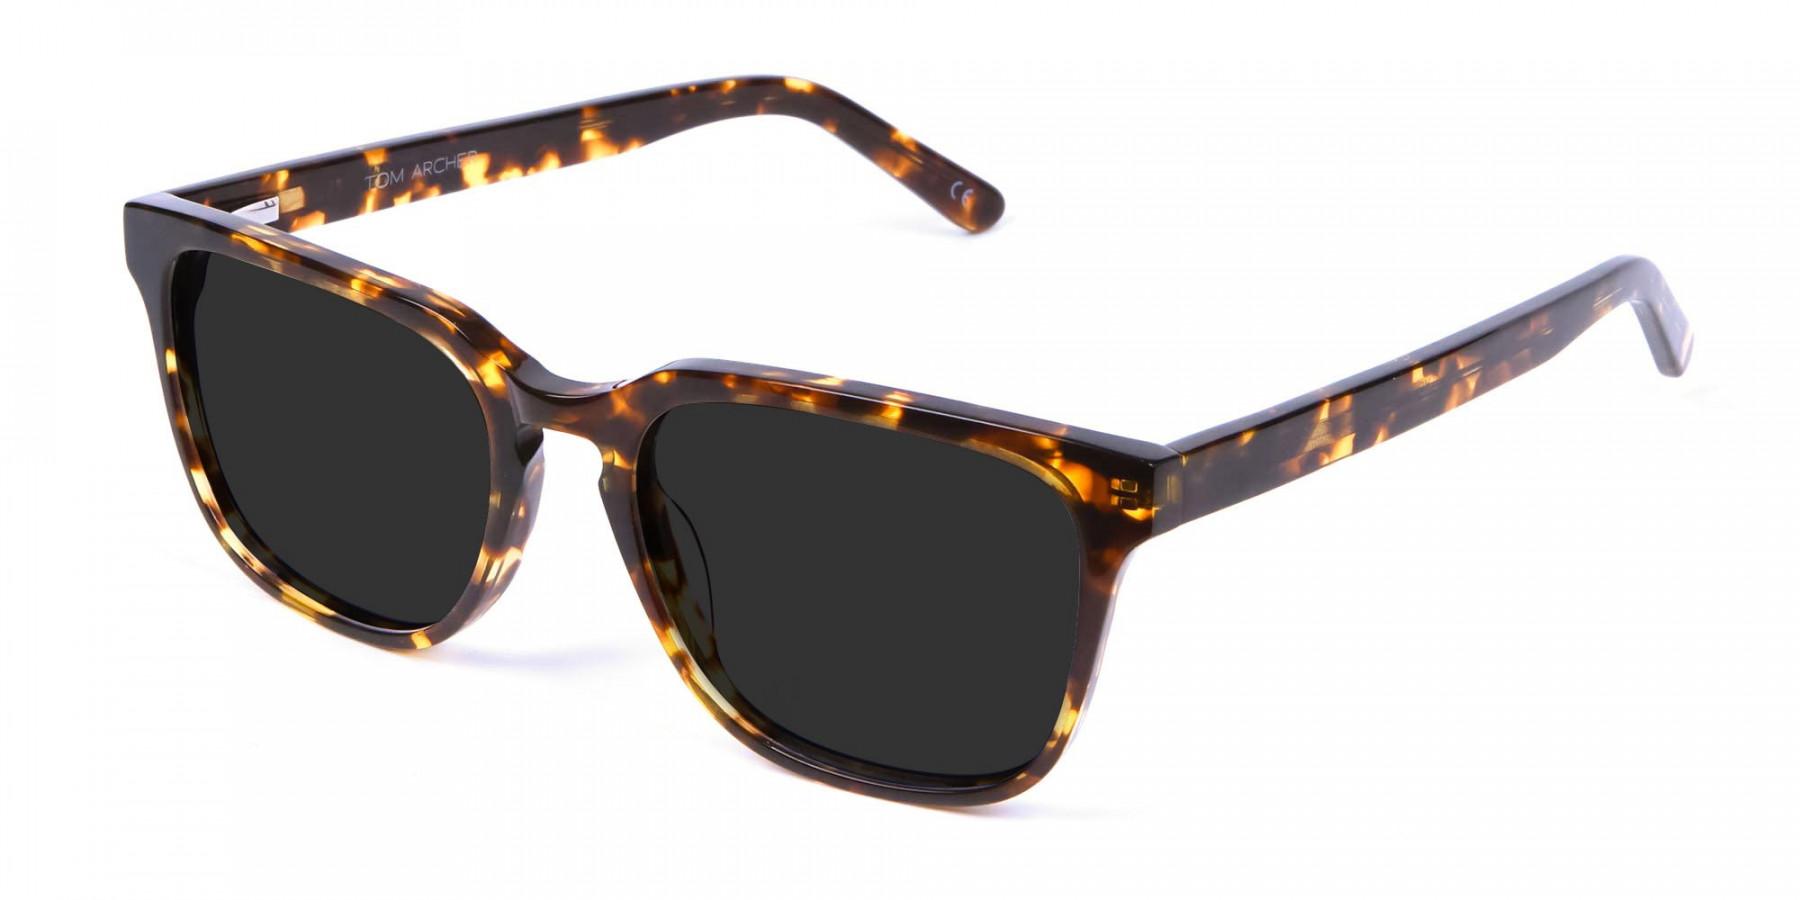 Oversized Square Sunglasses in Tortoiseshell  -3